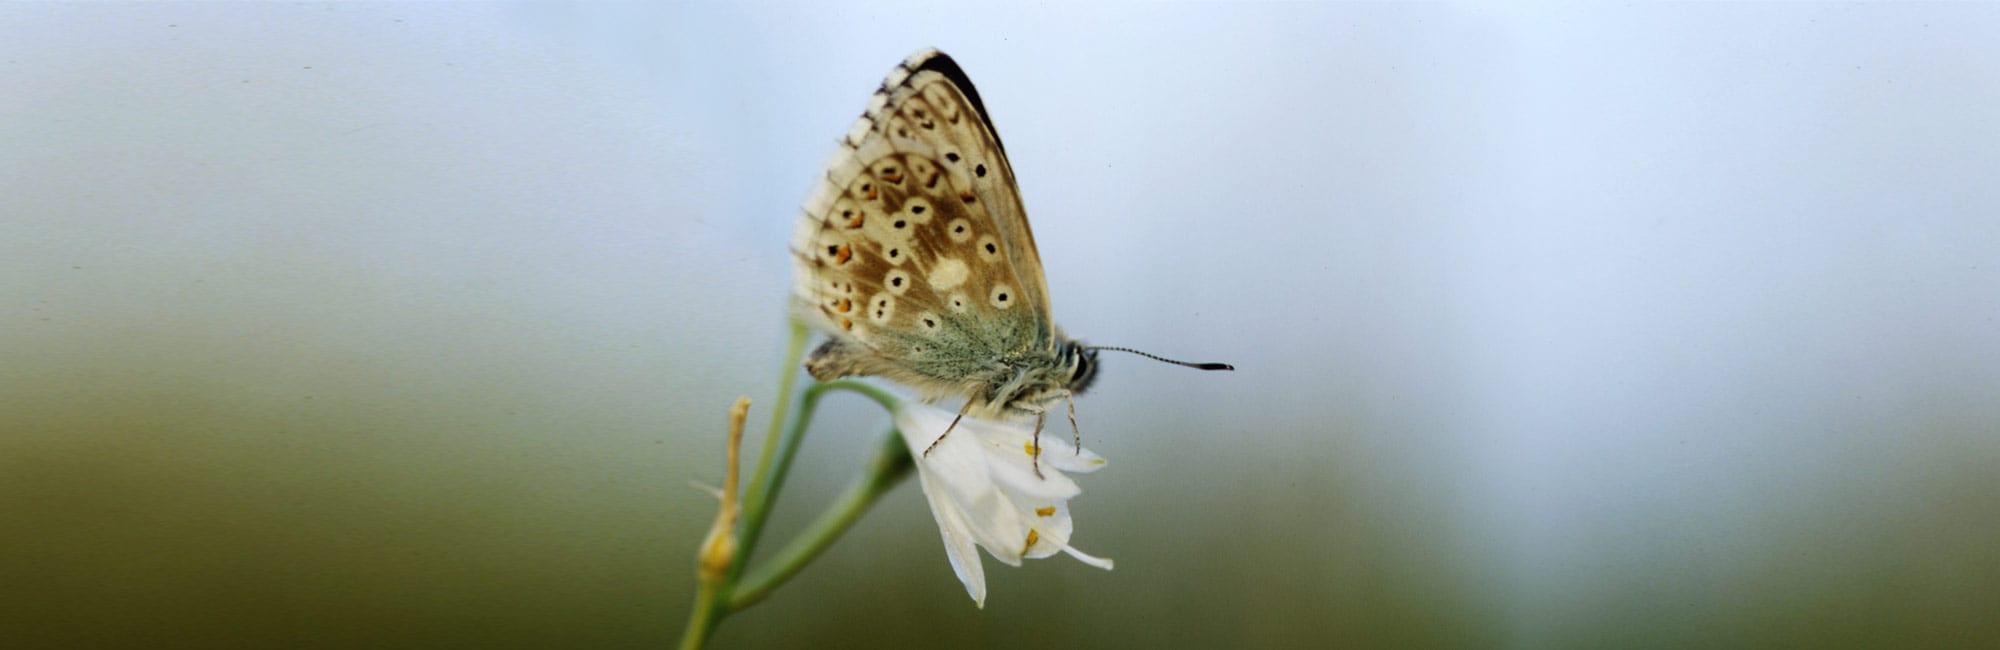 06-Schmetterling-Naturheilpraxis-Margret-Madejsky-Muenchen